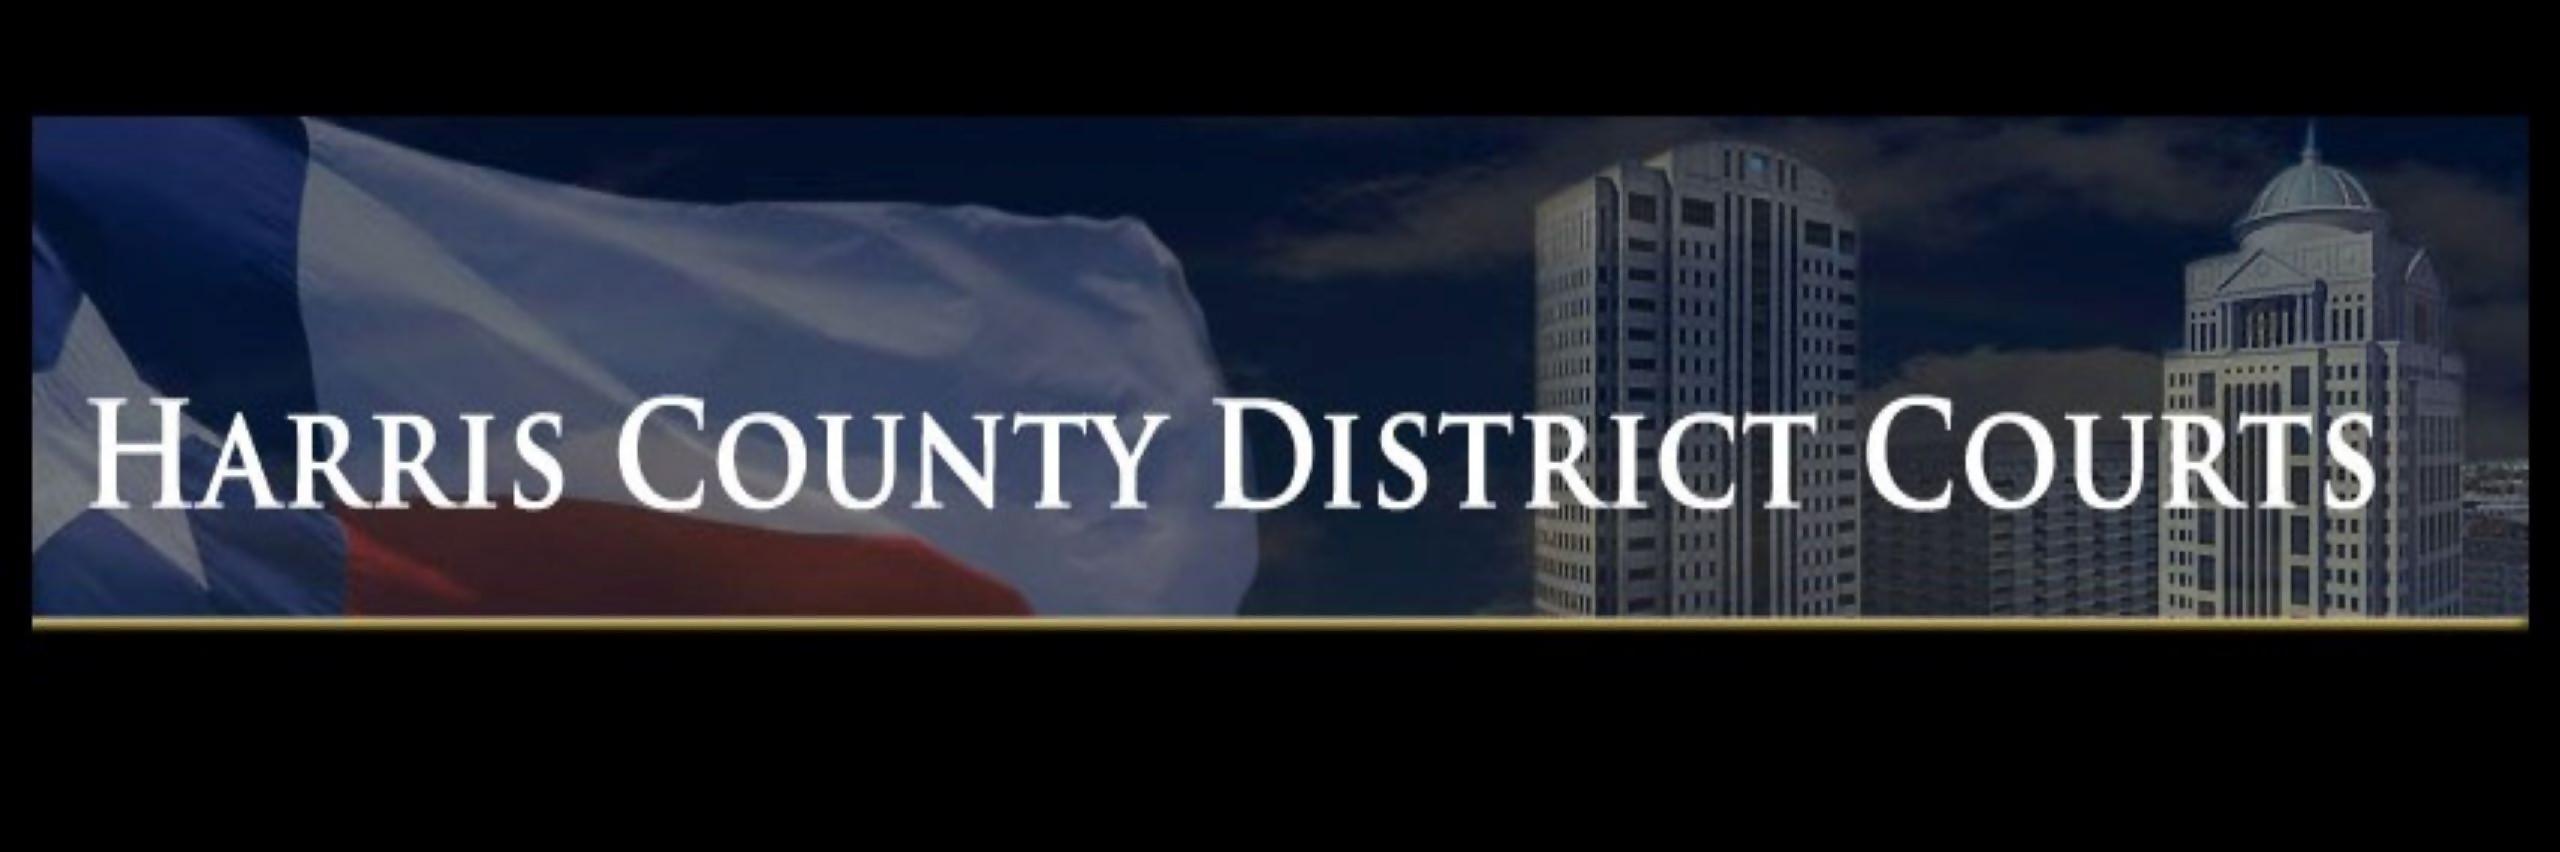 113th District Court - Live Stream